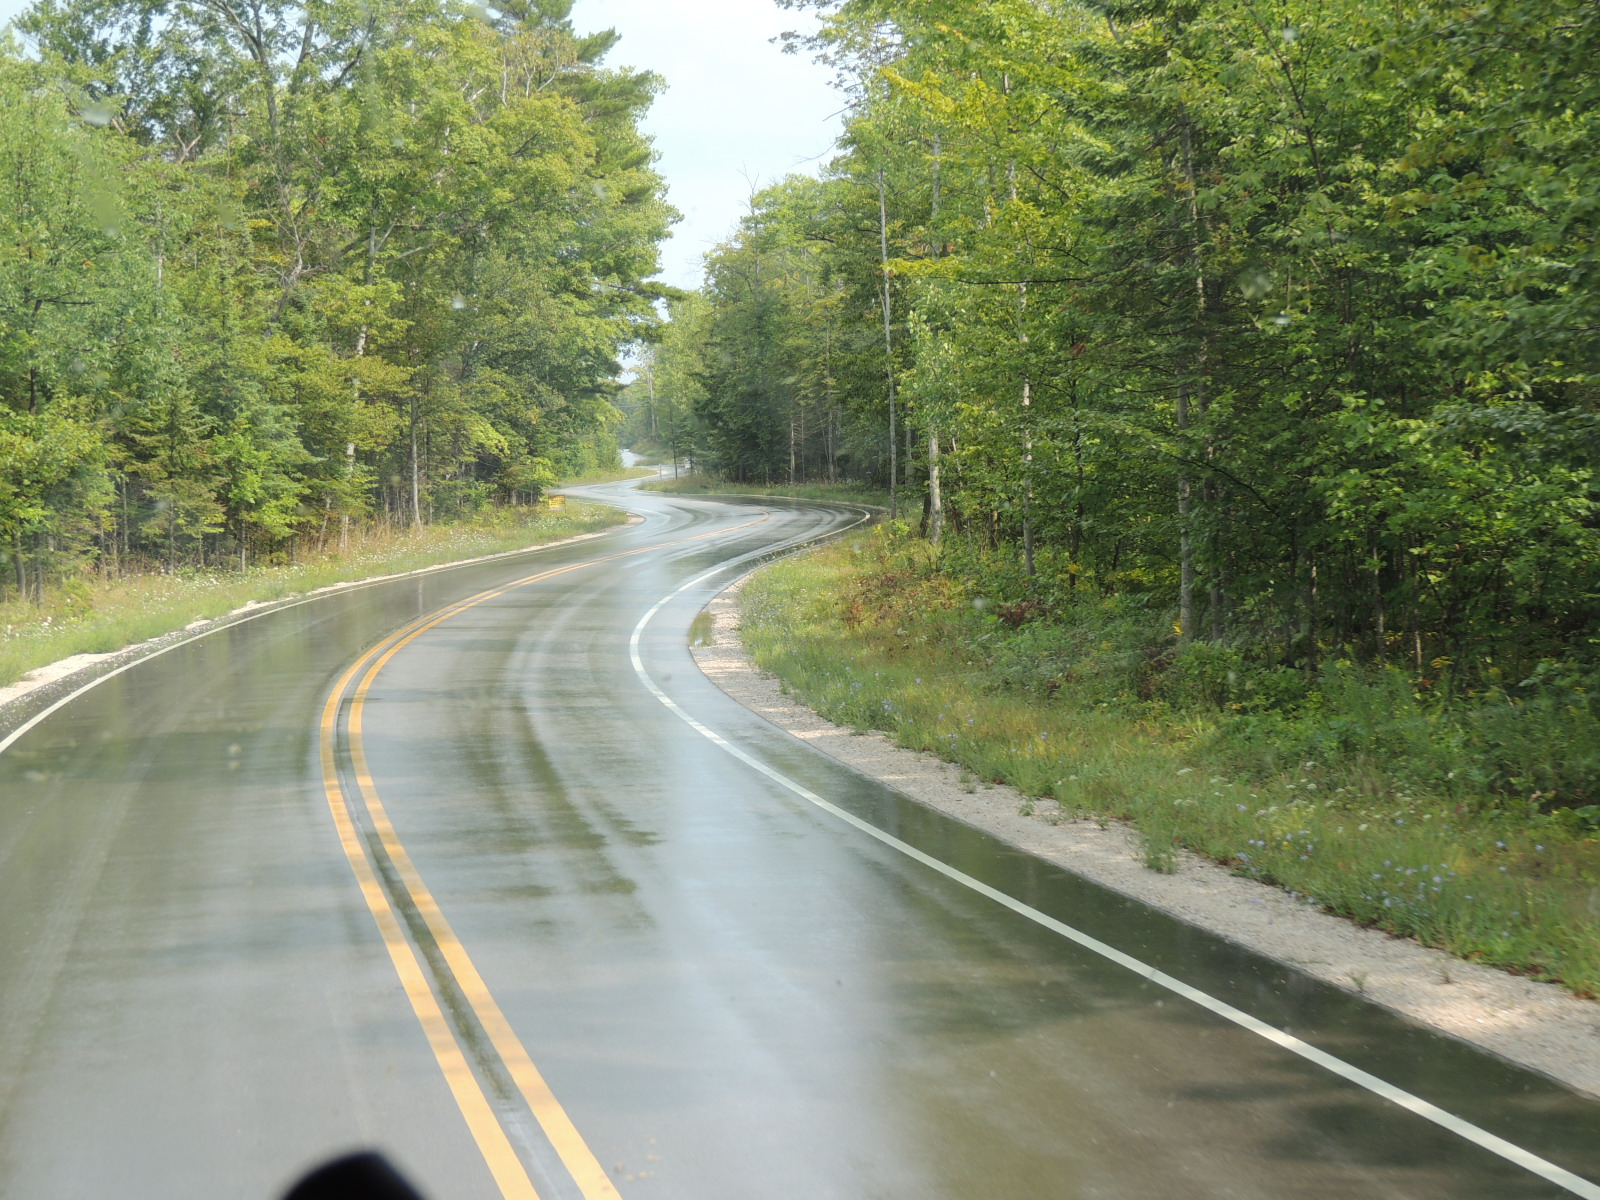 Road laid around trees